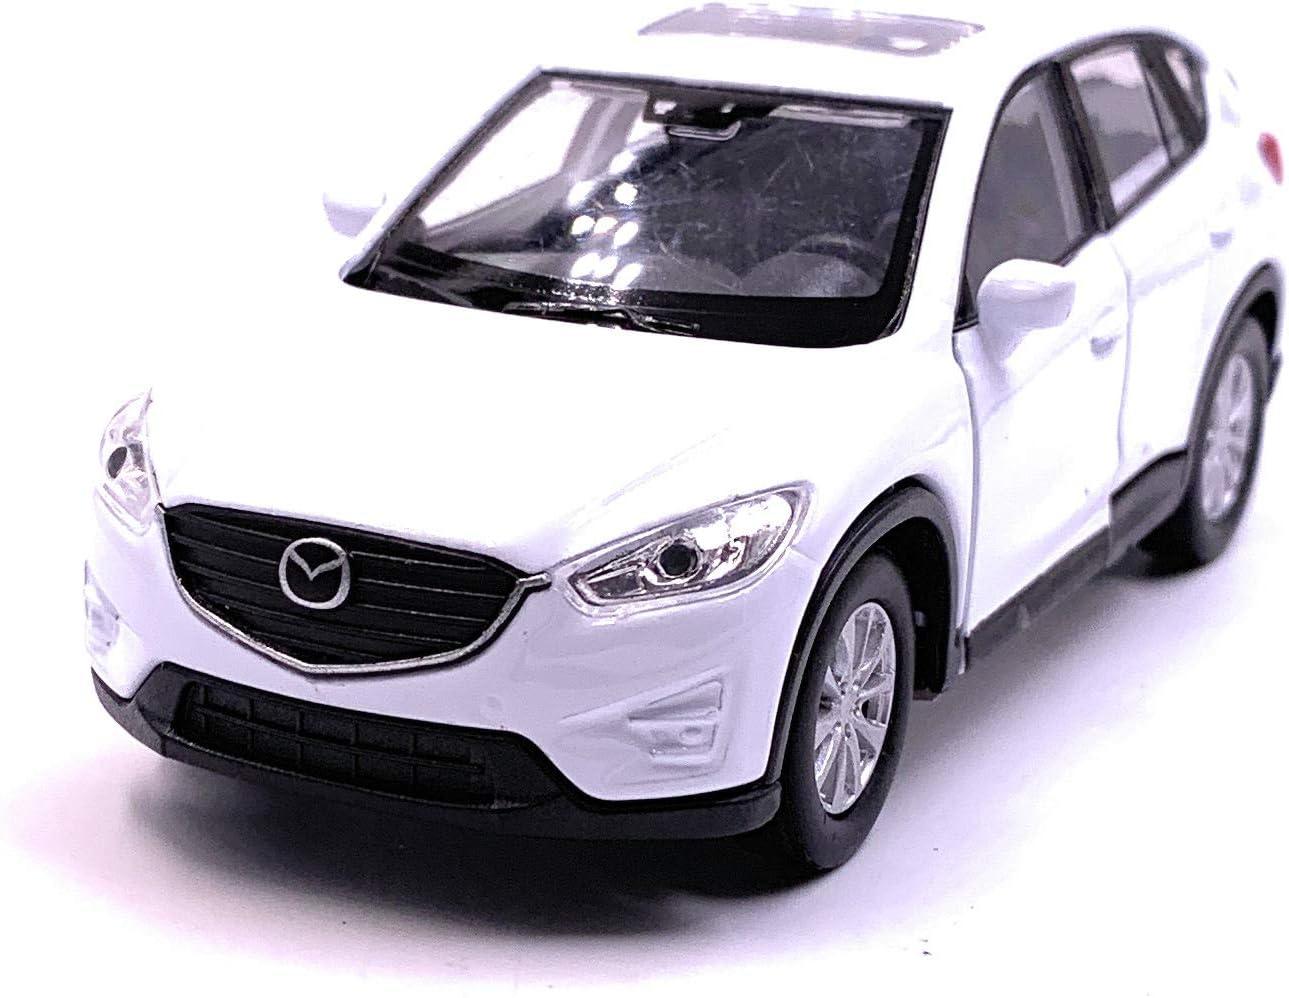 Onlineworld2013 Cx 5 Modellauto Auto Weiss Maßstab 1 34 Lizensiert Auto